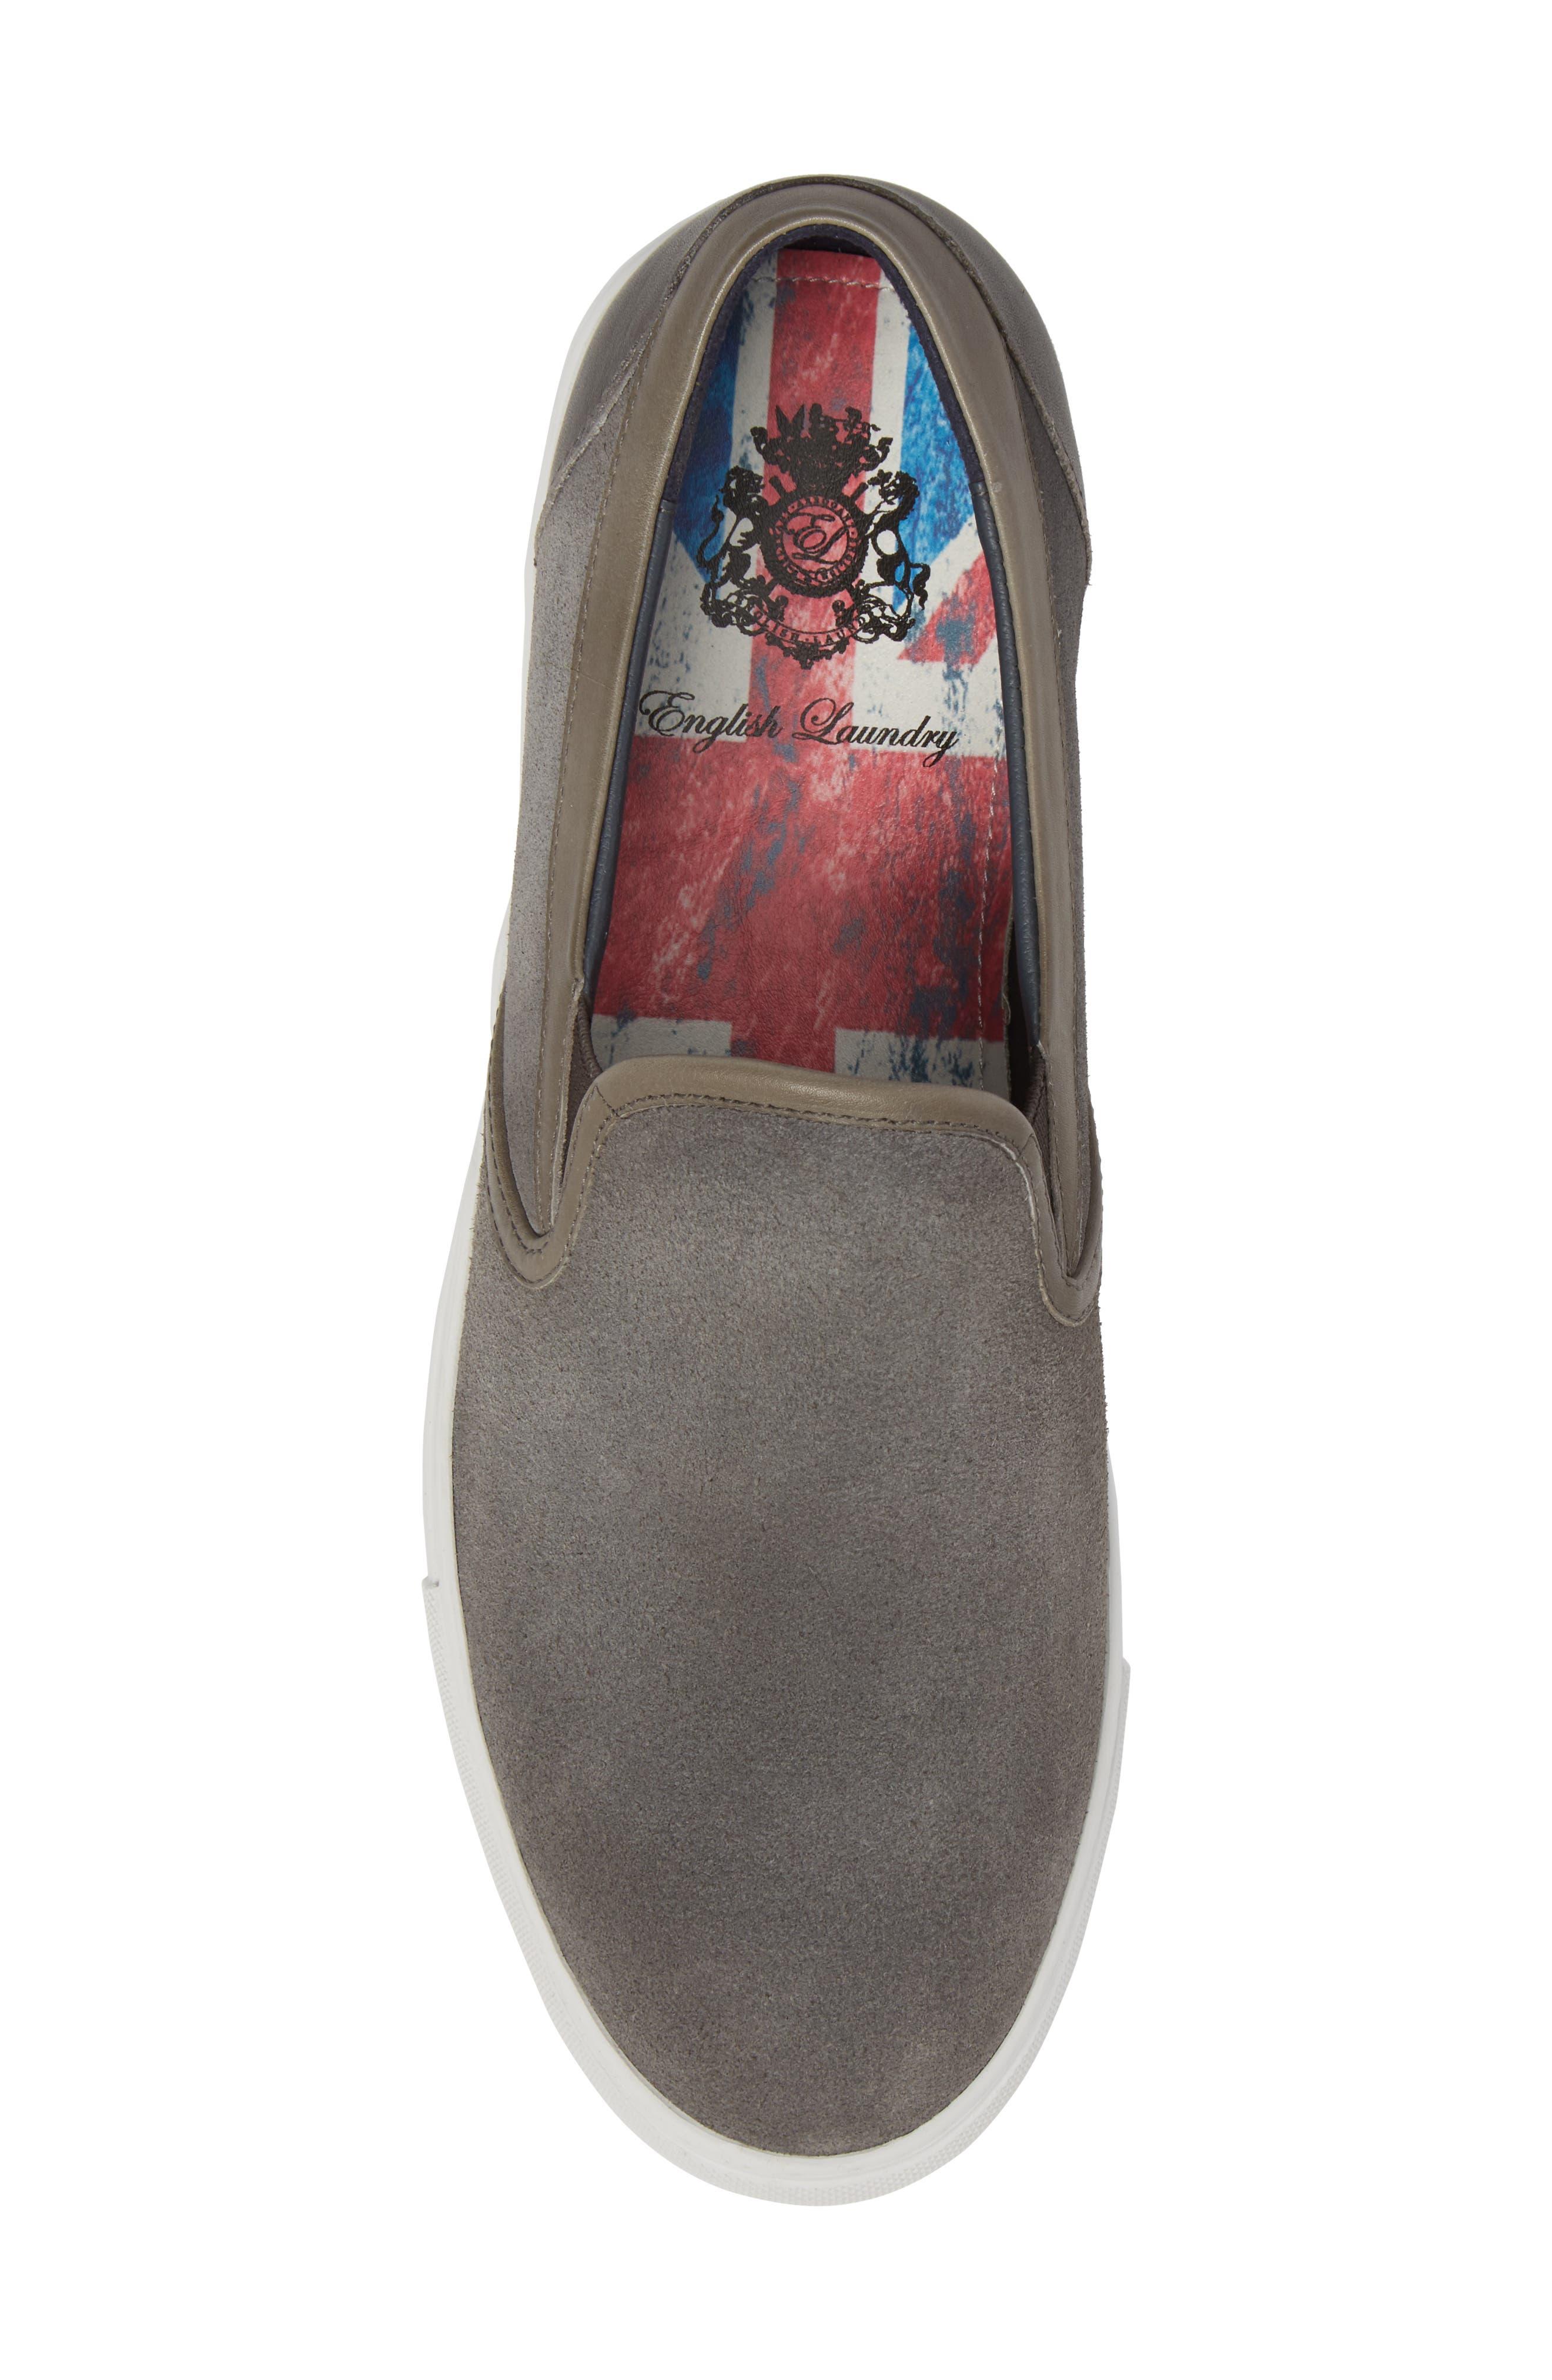 Vane Slip-On Sneaker,                             Alternate thumbnail 5, color,                             GREY SUEDE/ LEATHER